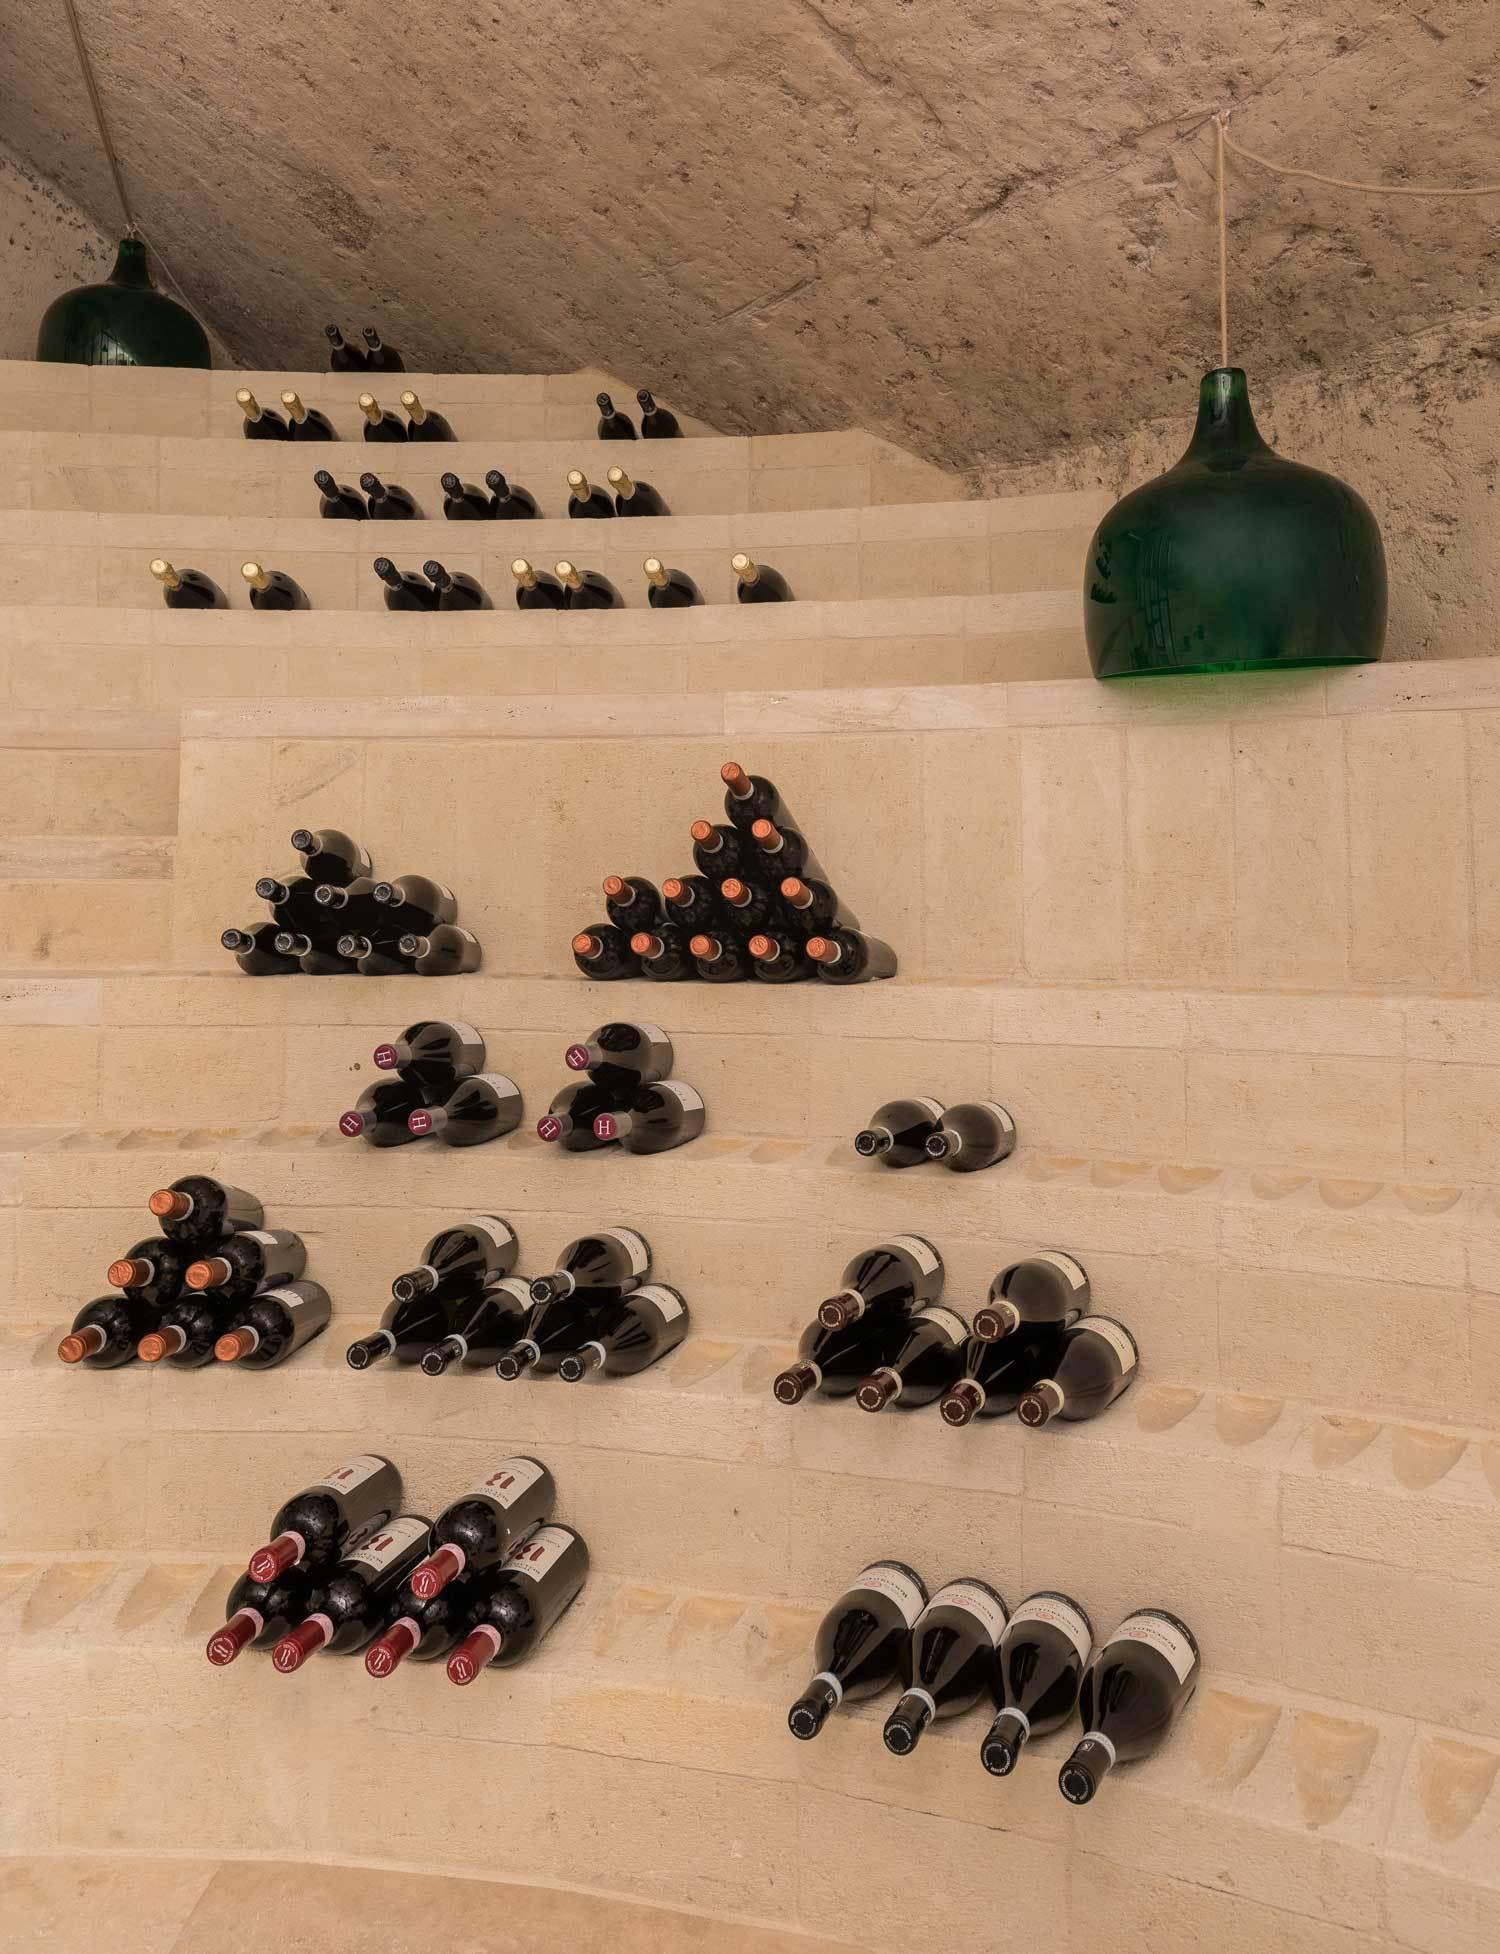 Enoteca-dai-Tosi-Wine-Bar-in-Matera-Italy-by-Architecten-De-Vylder-Vinck-Taillieu-cafeveyafe (11)